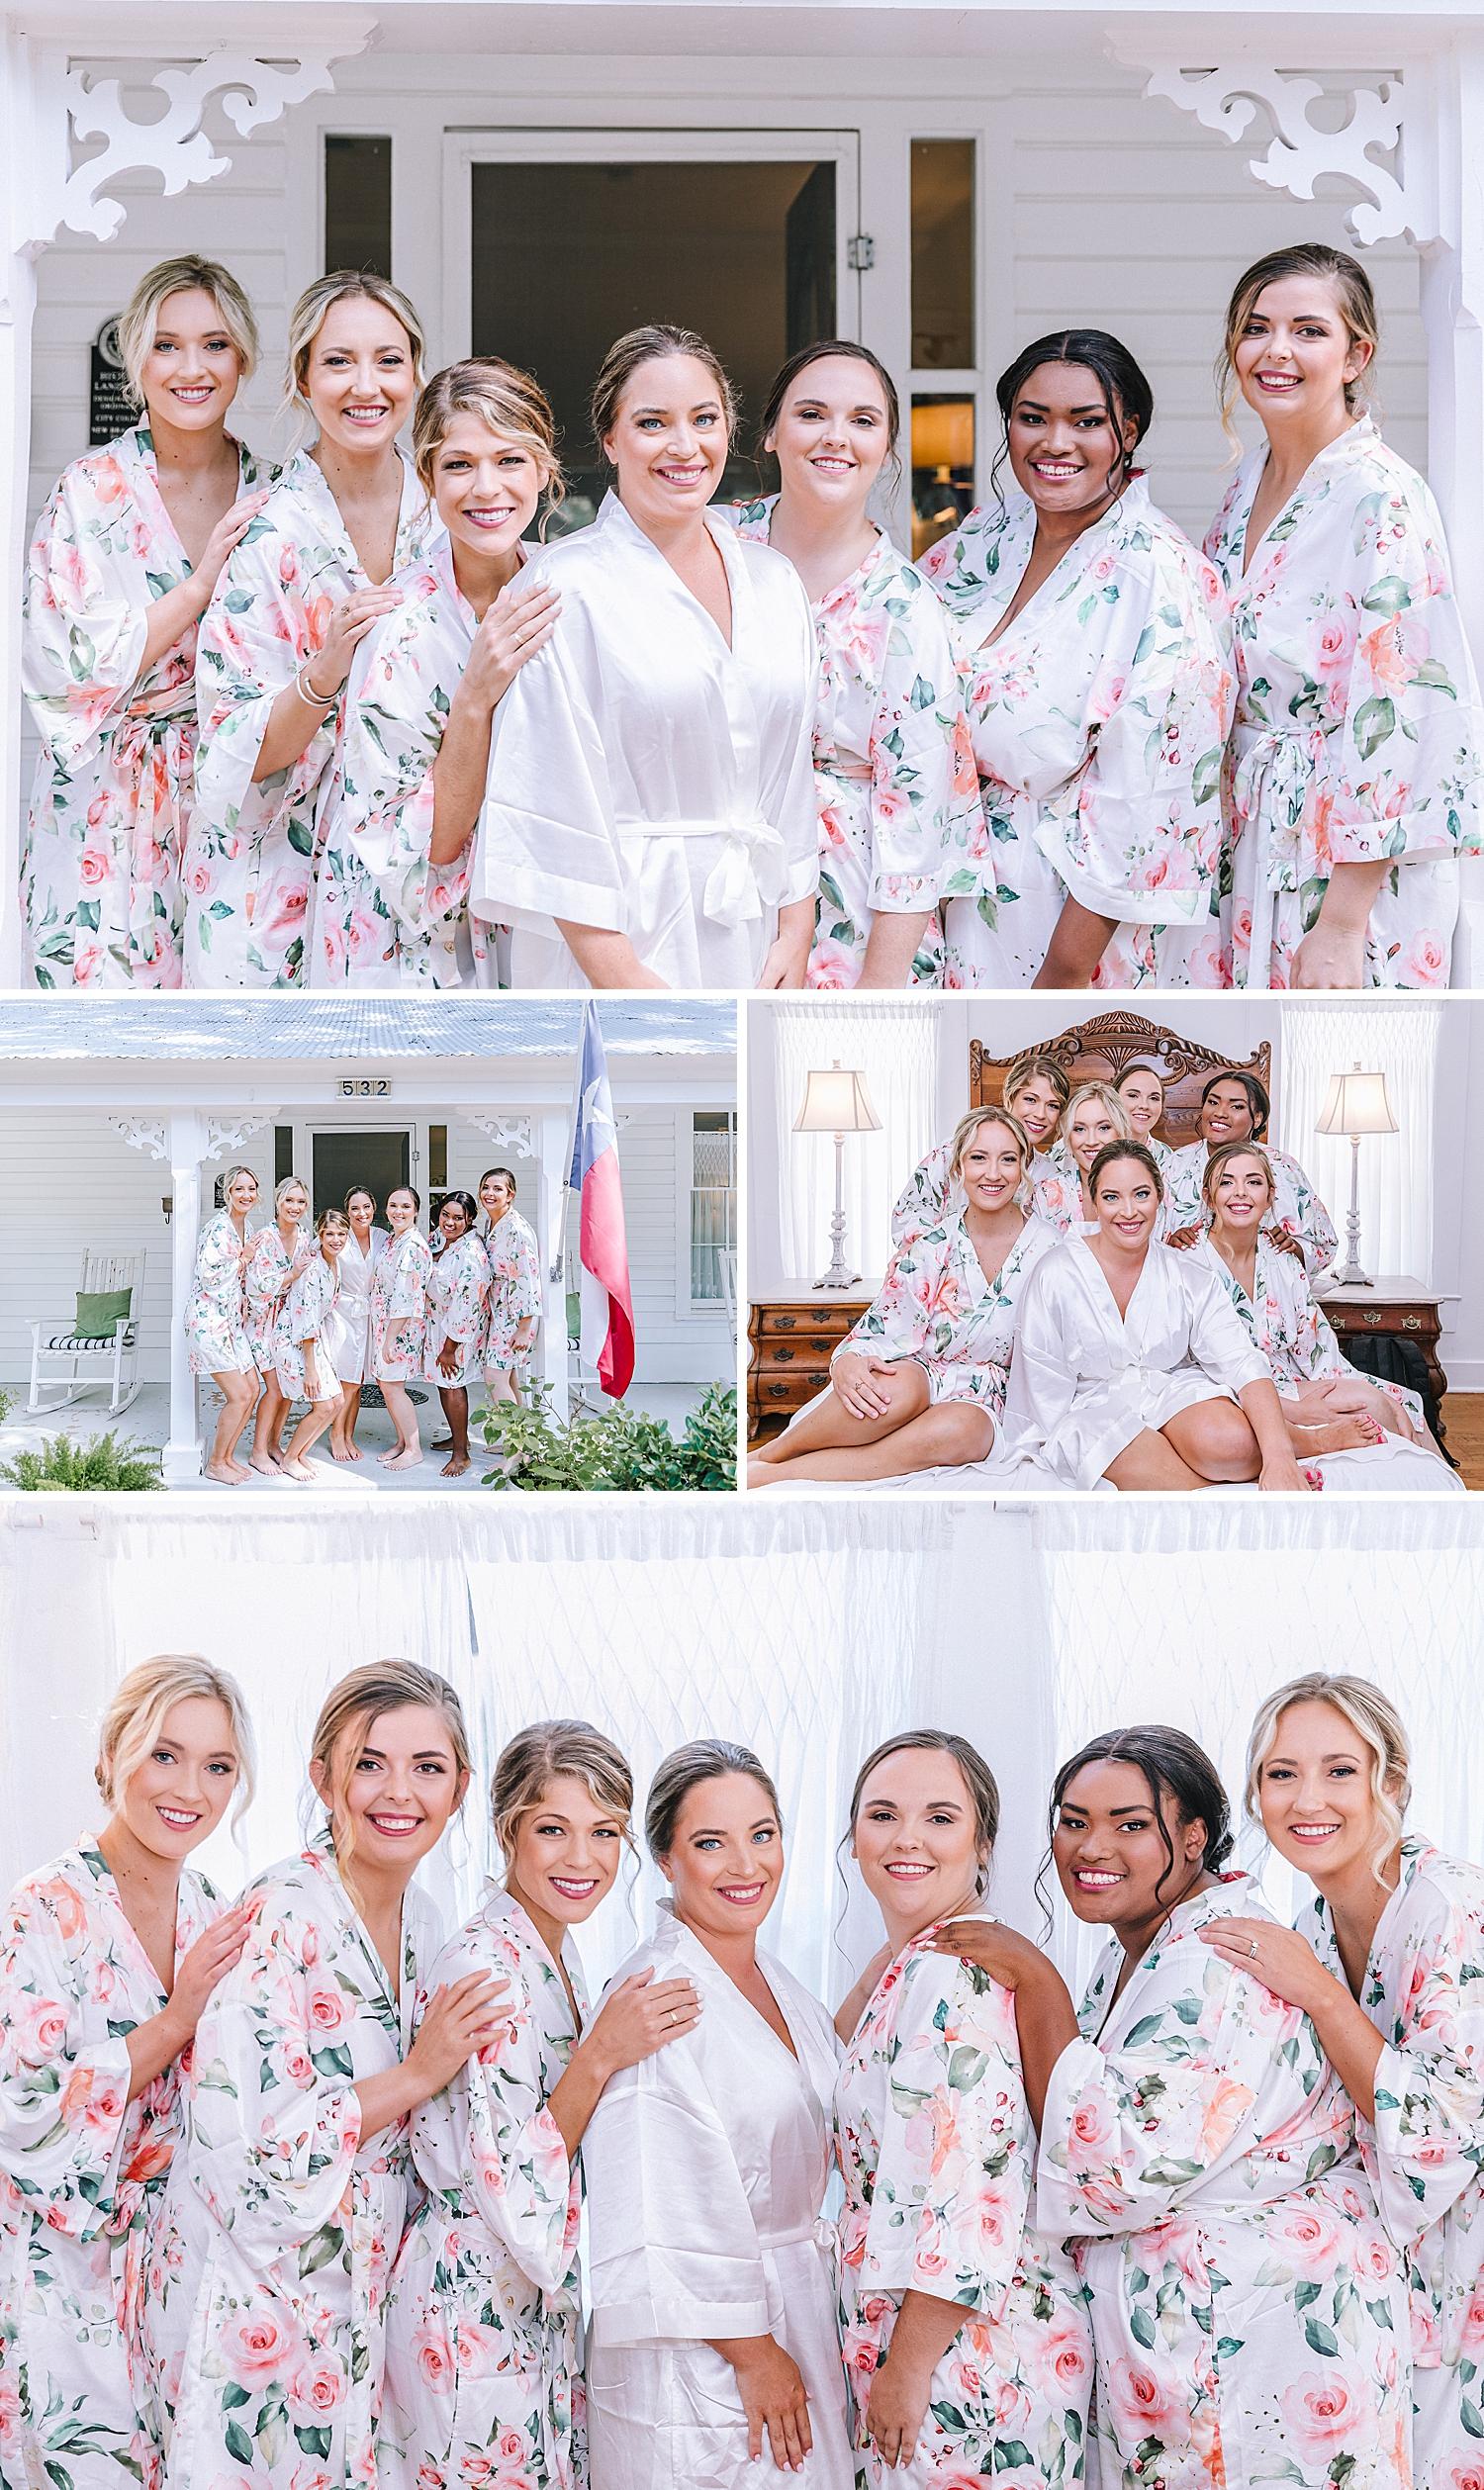 Gruene-Estate-Wedding-New-Braunfels-Bride-Wedding-Photos-Carly-Barton-Photography_0070.jpg